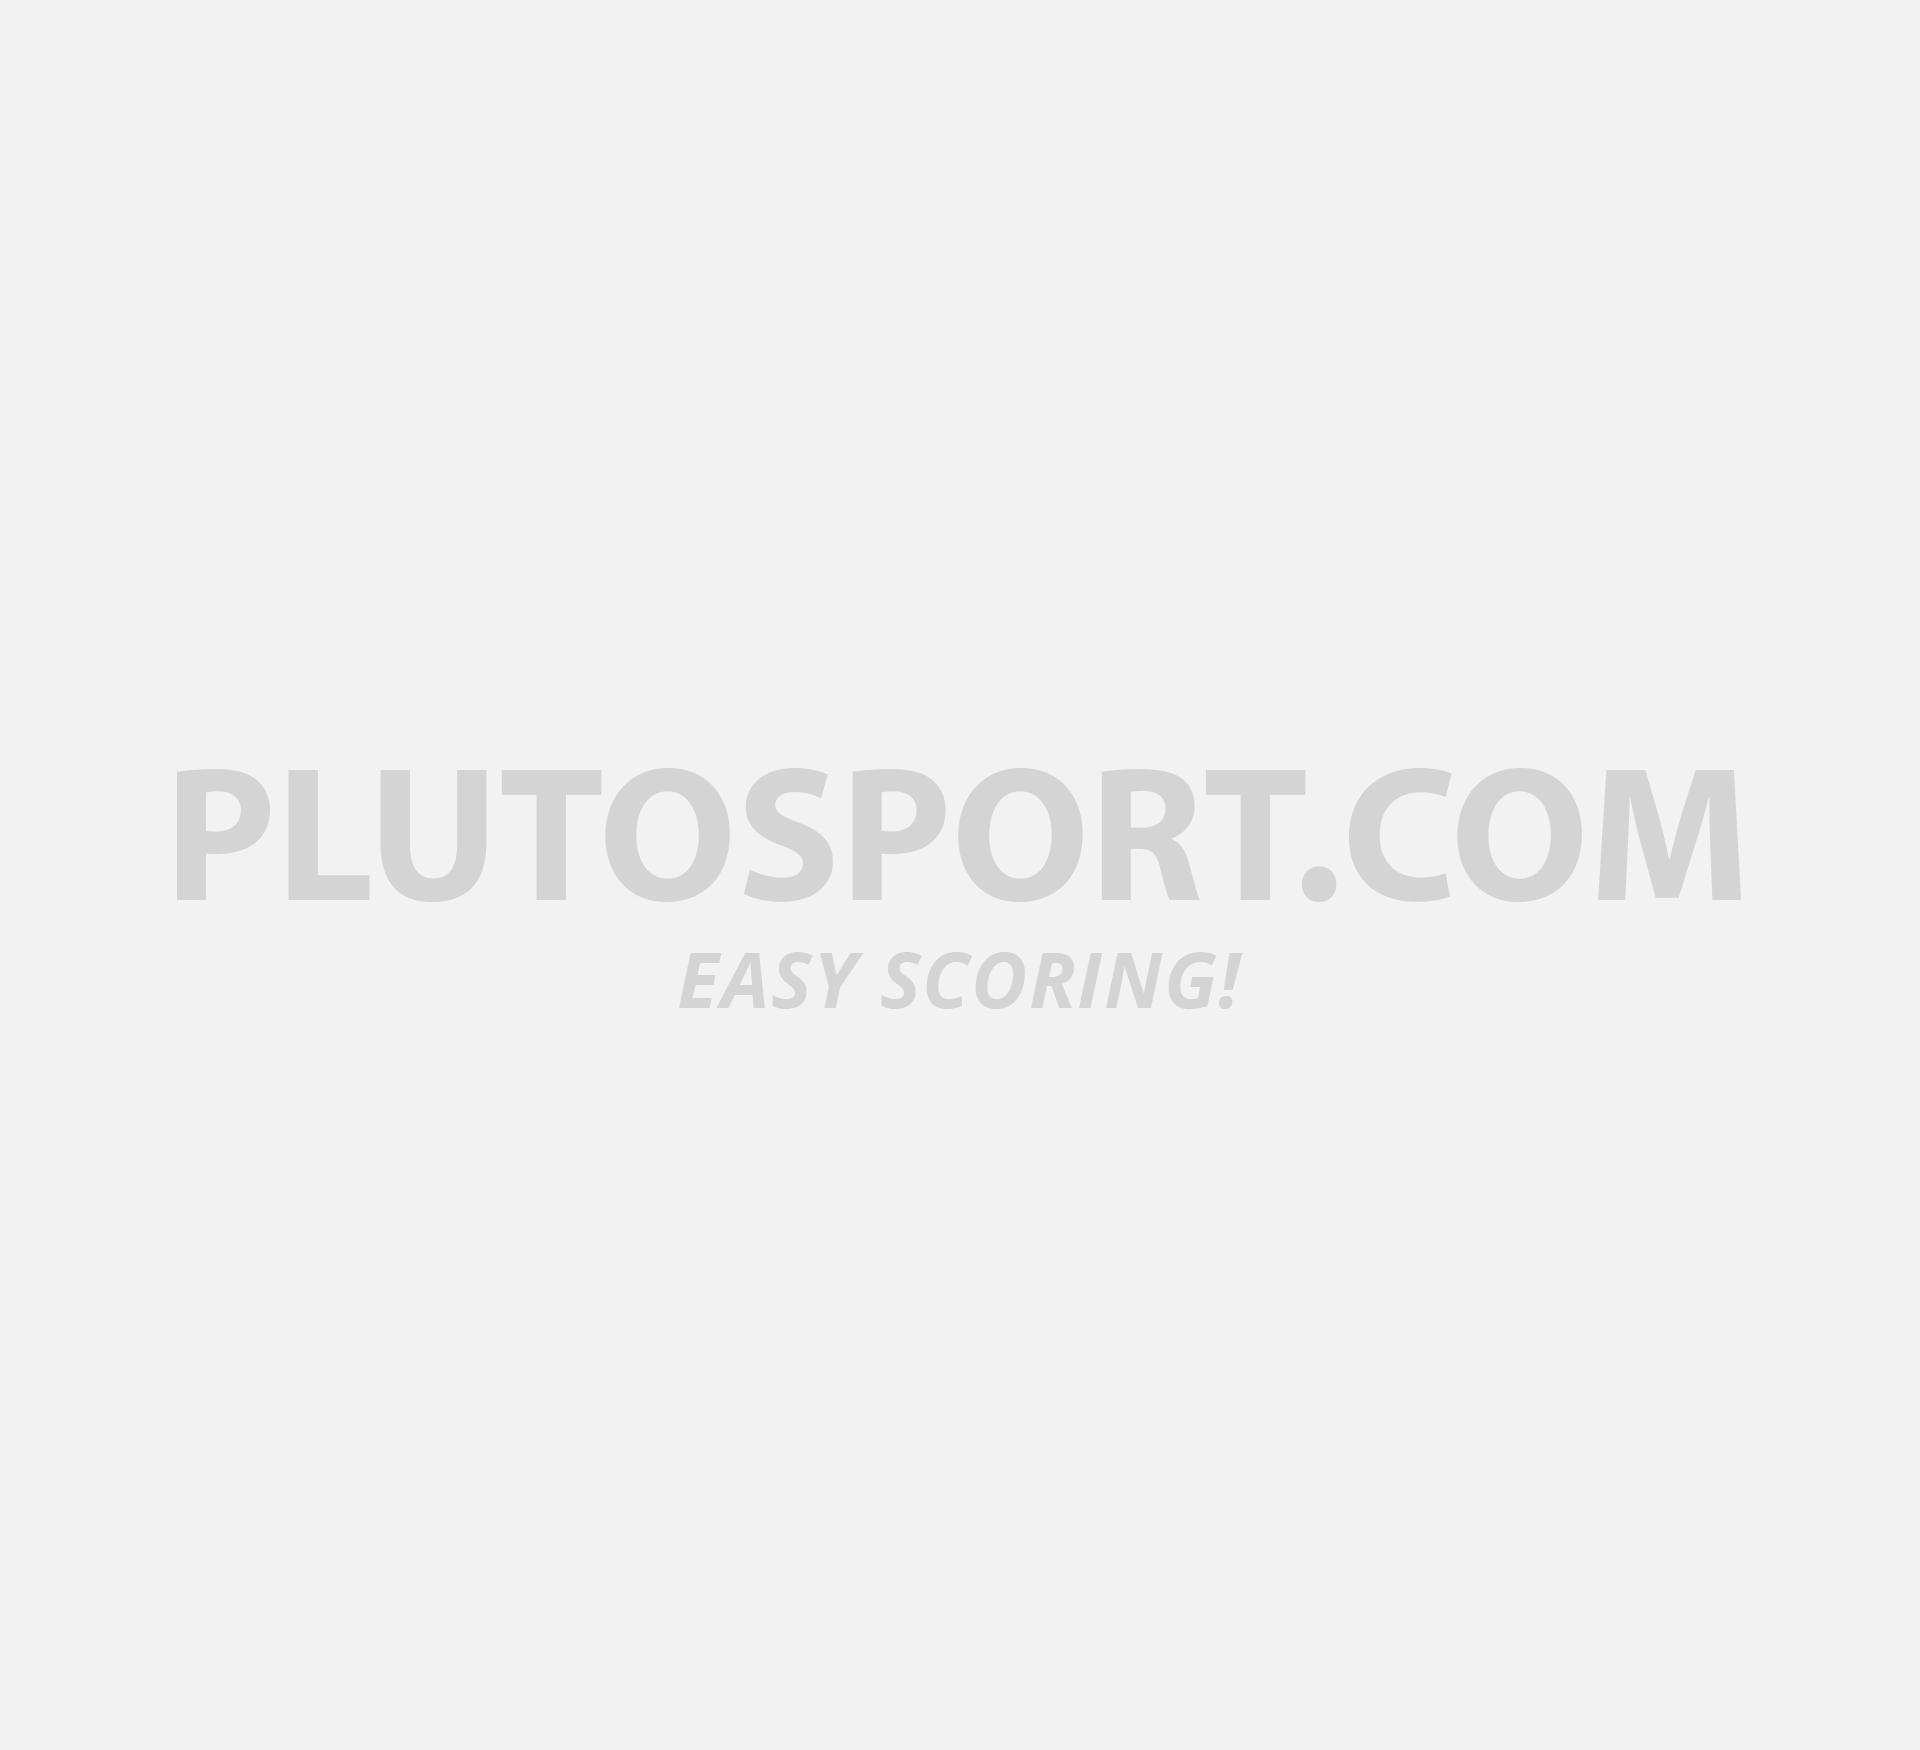 e929003f865 Puma Vikky Platform Ribbon Bold W - Sneakers - Shoes - Lifestyle - Sports |  Plutosport